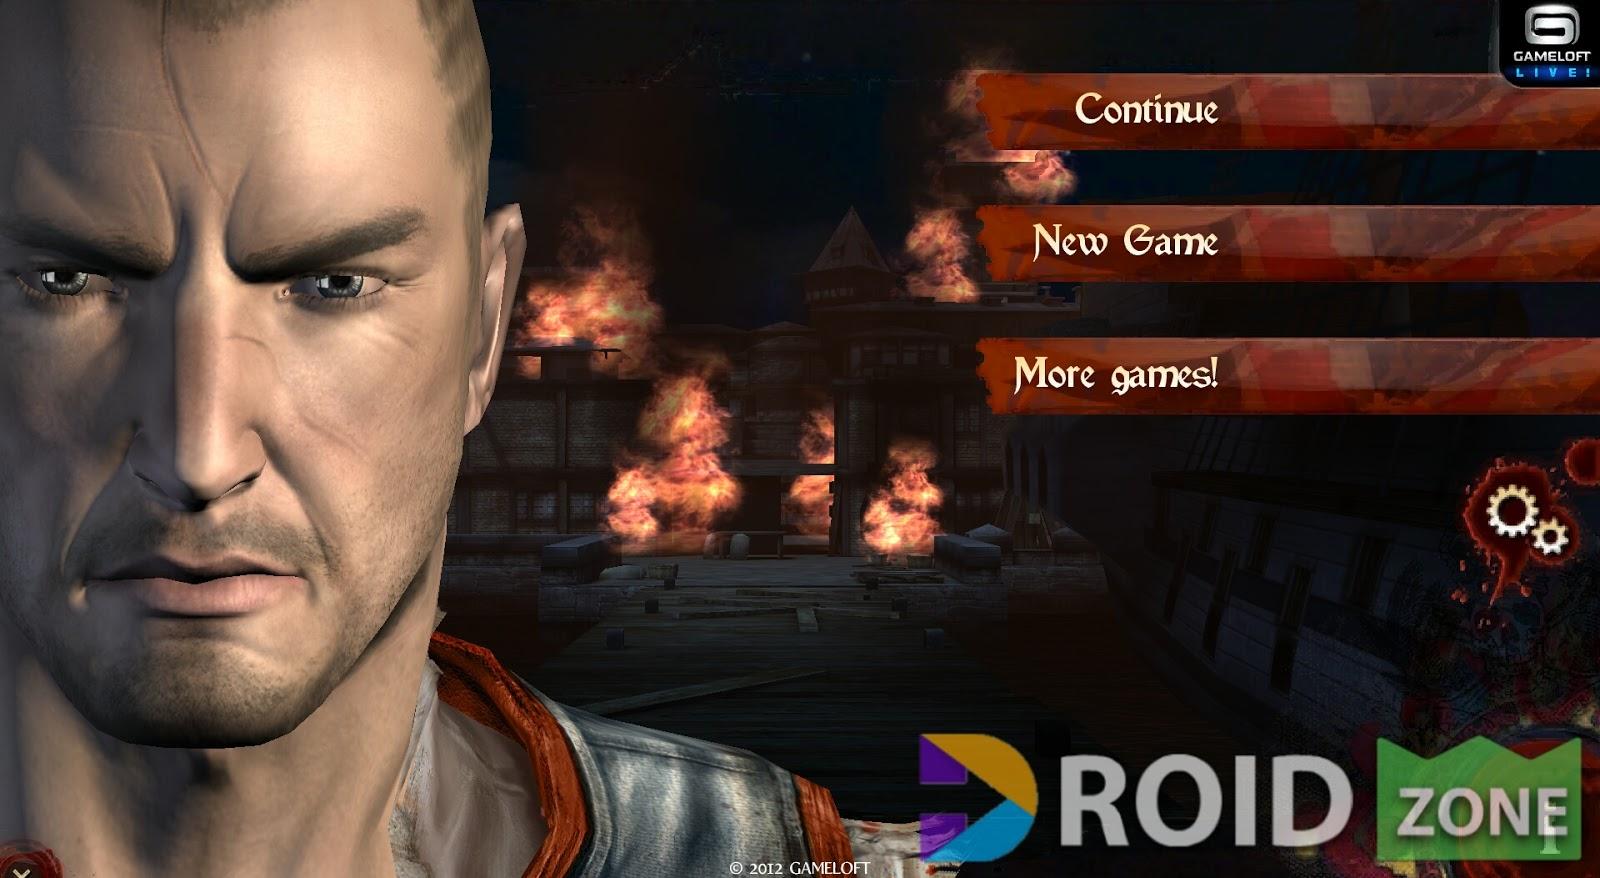 backstab gameloft ending a relationship